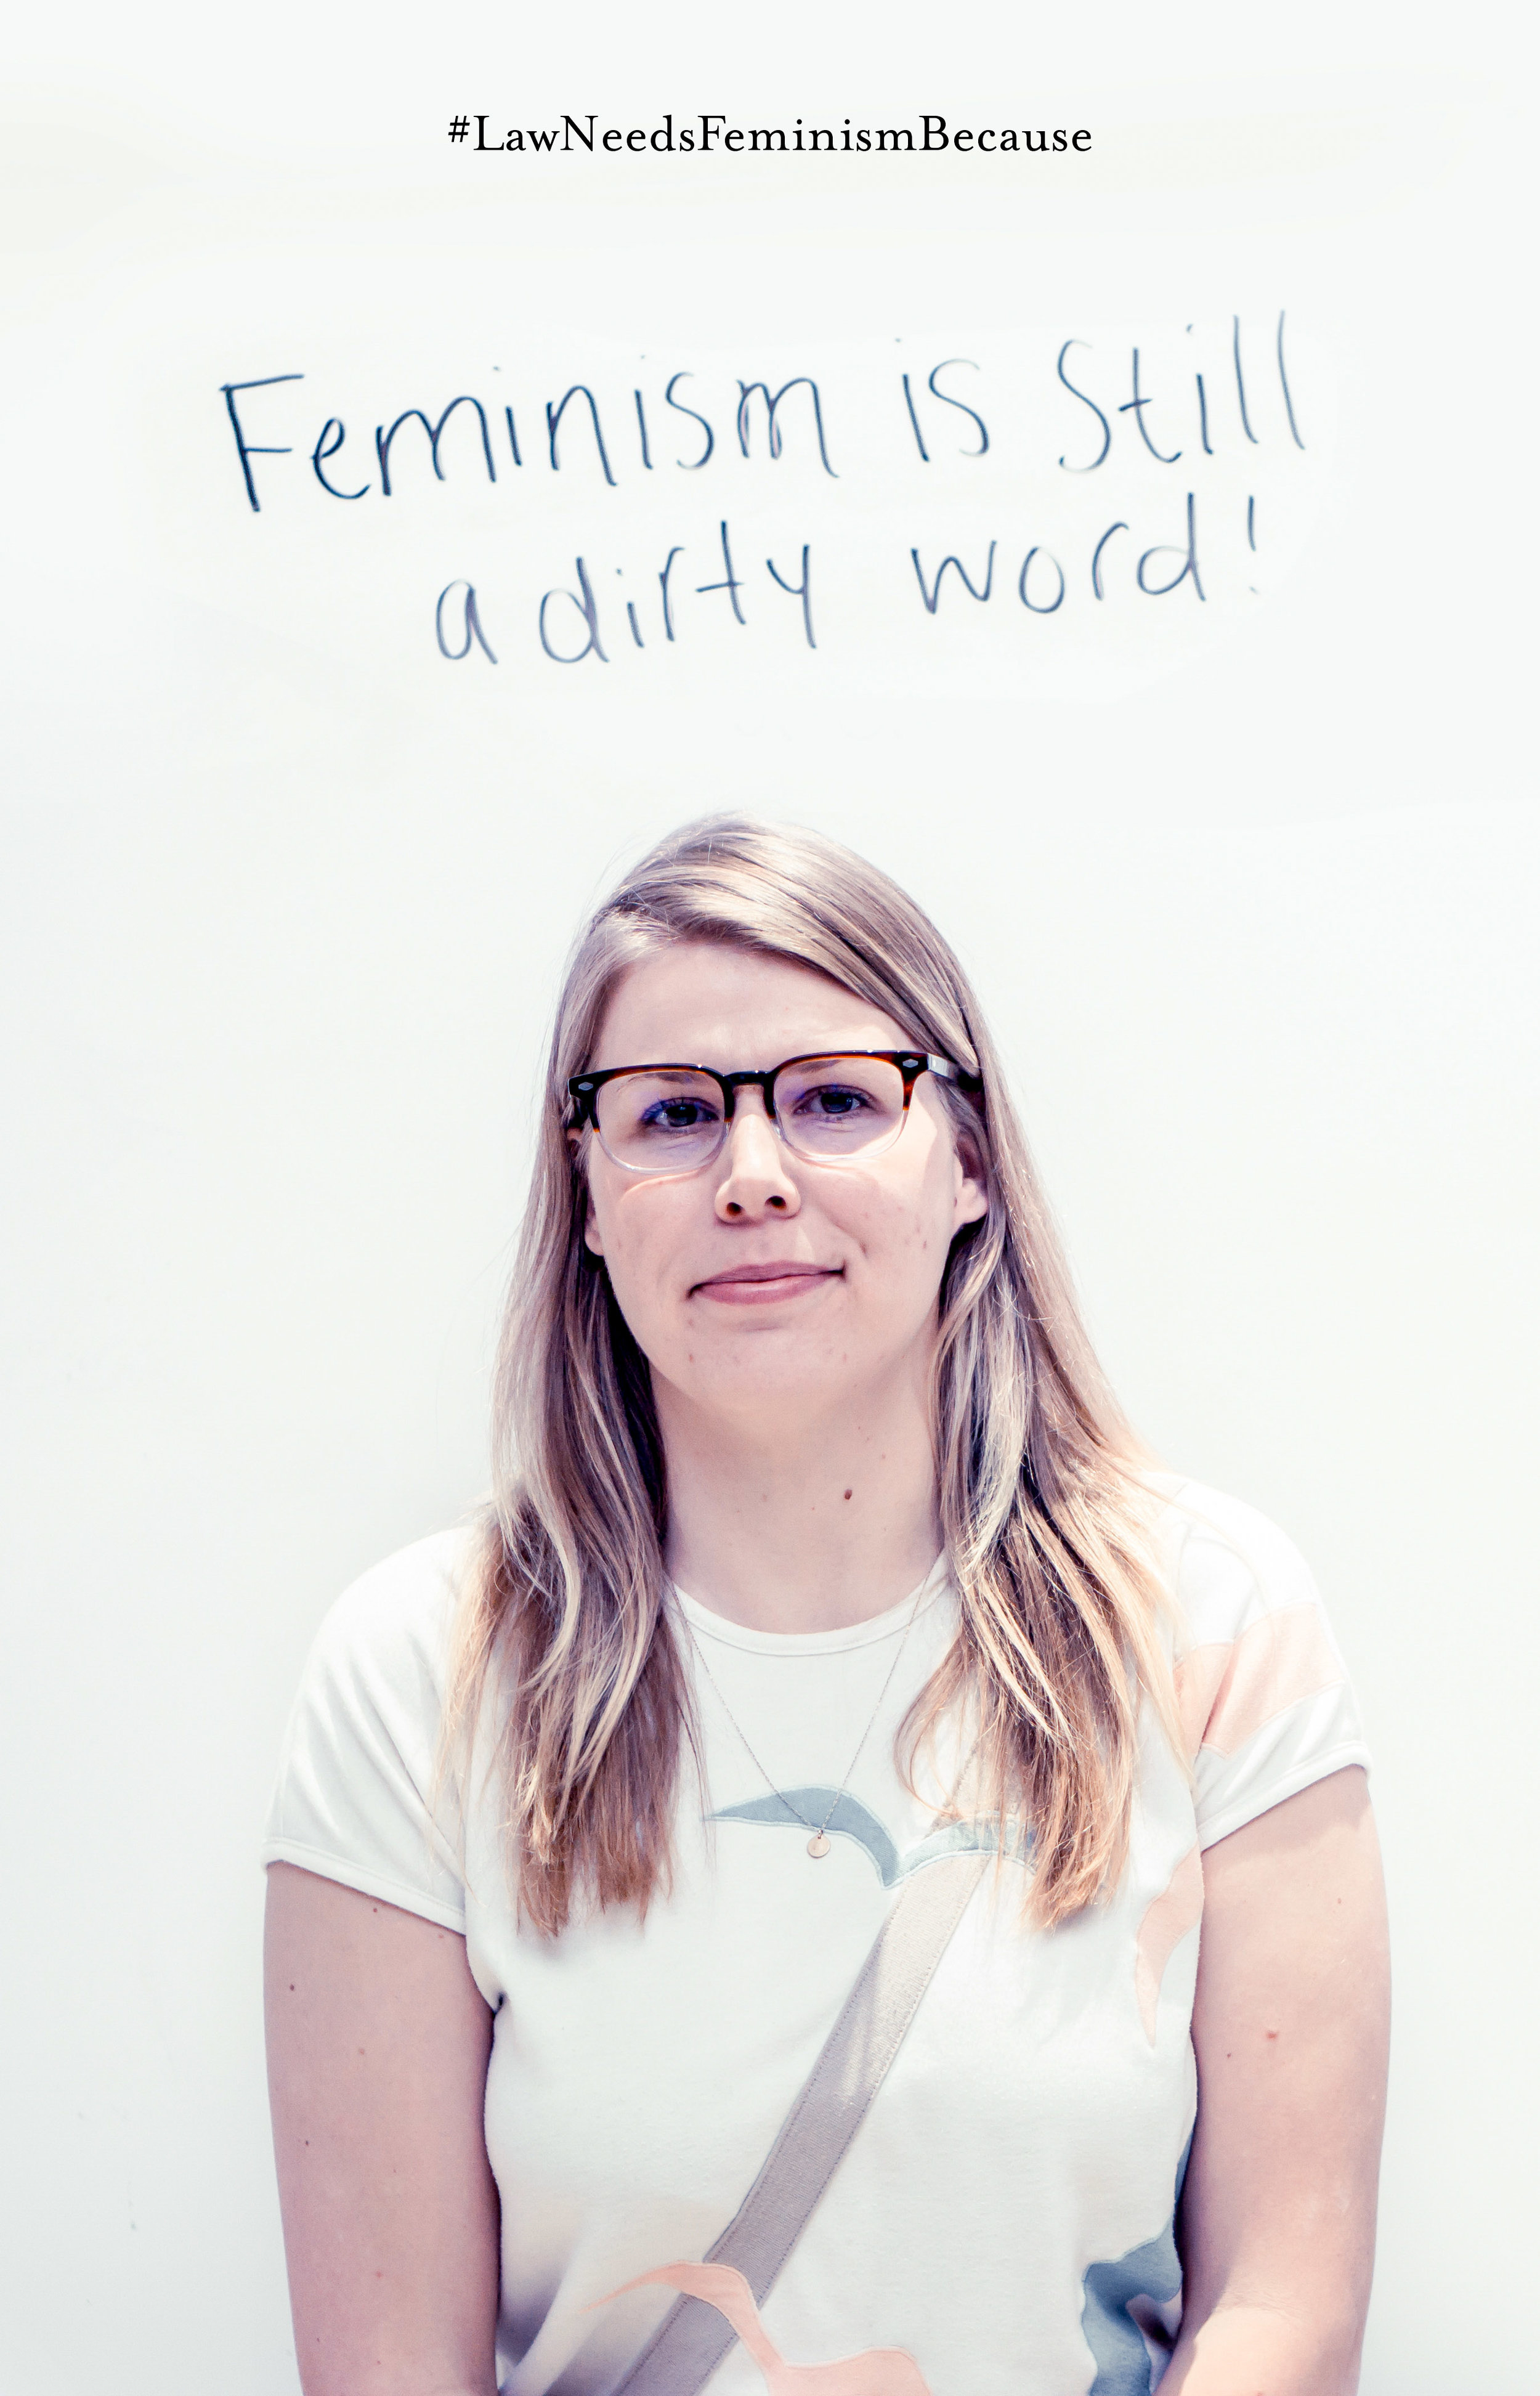 #LawNeedsFeminismBecause-2.jpg